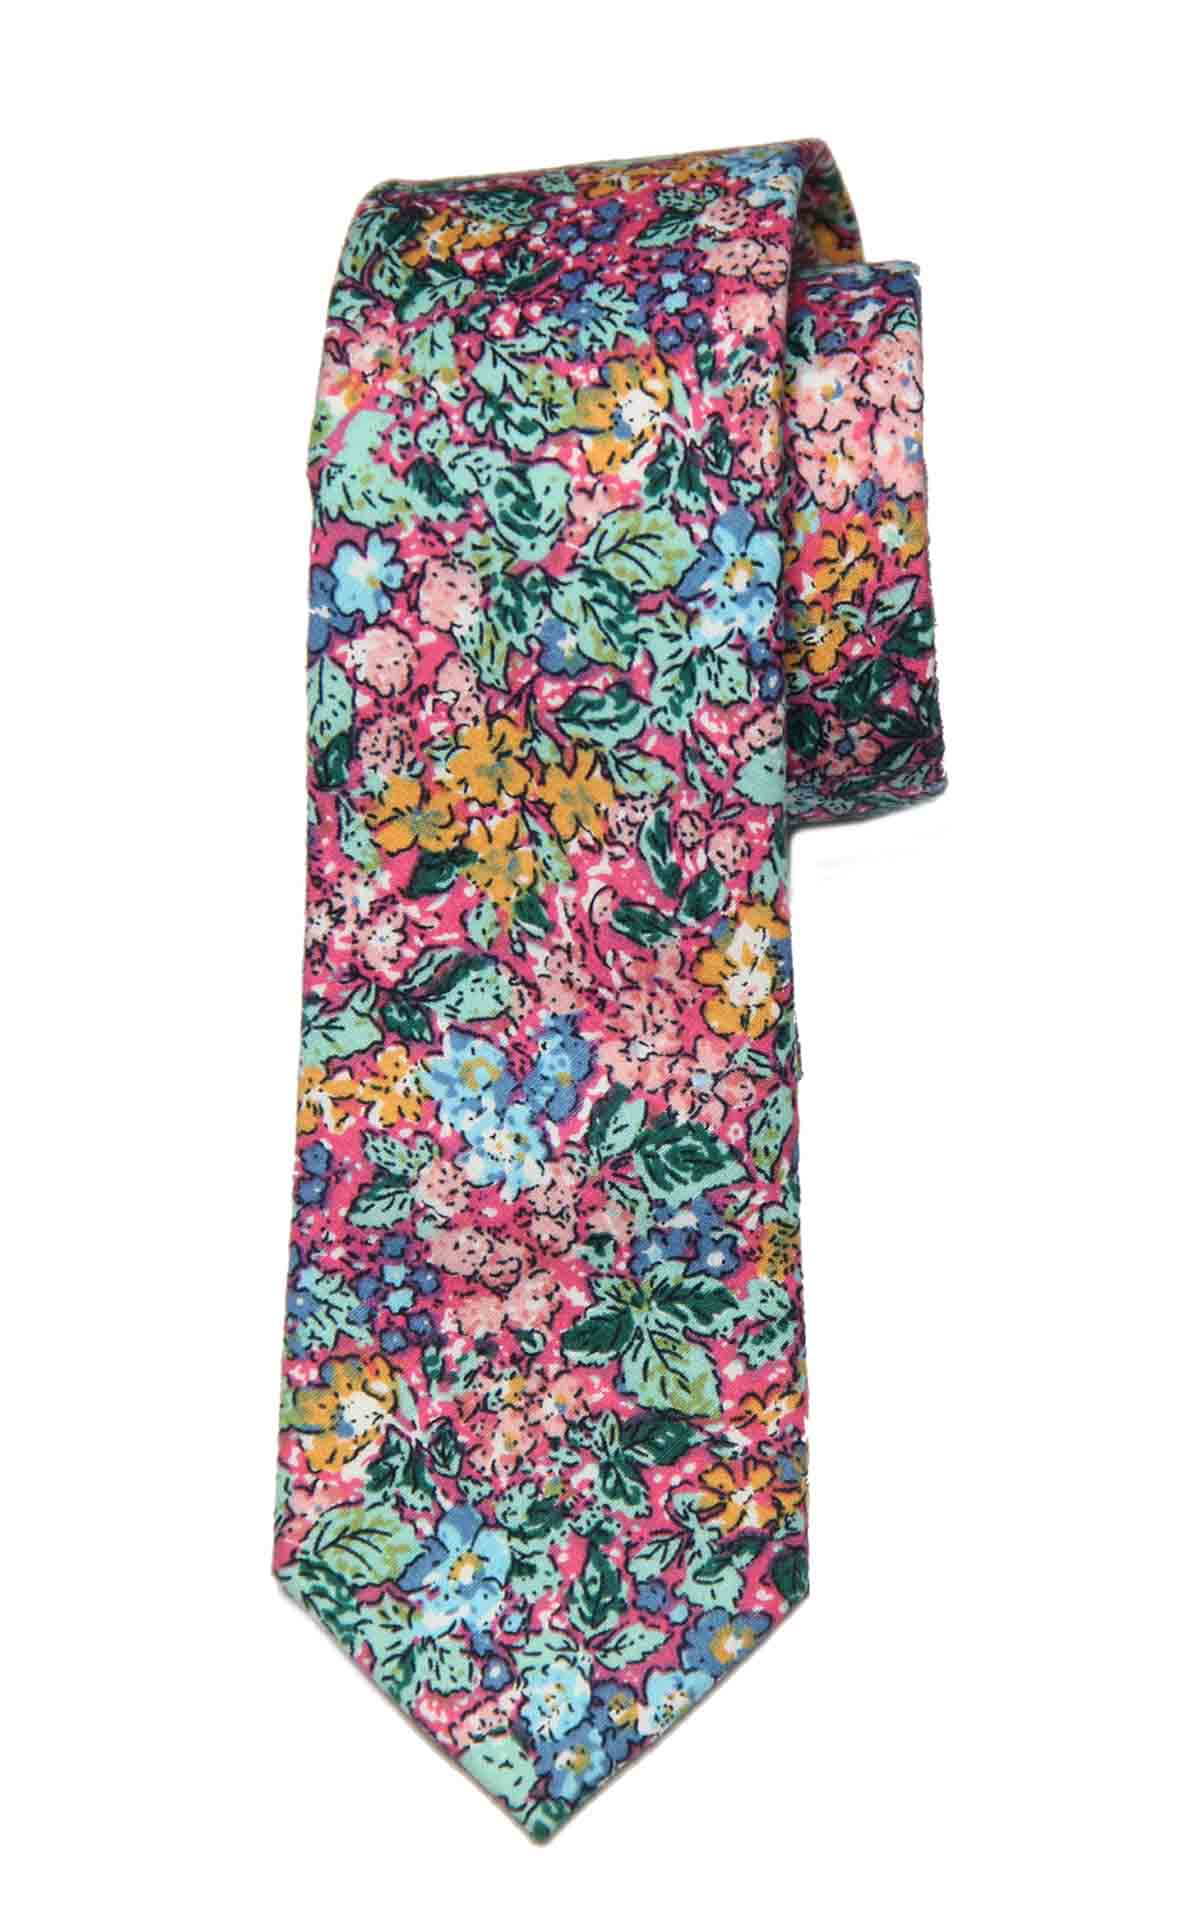 Gascoigne Tie Floral Cotton Narrow Multicolor Men's Narrow